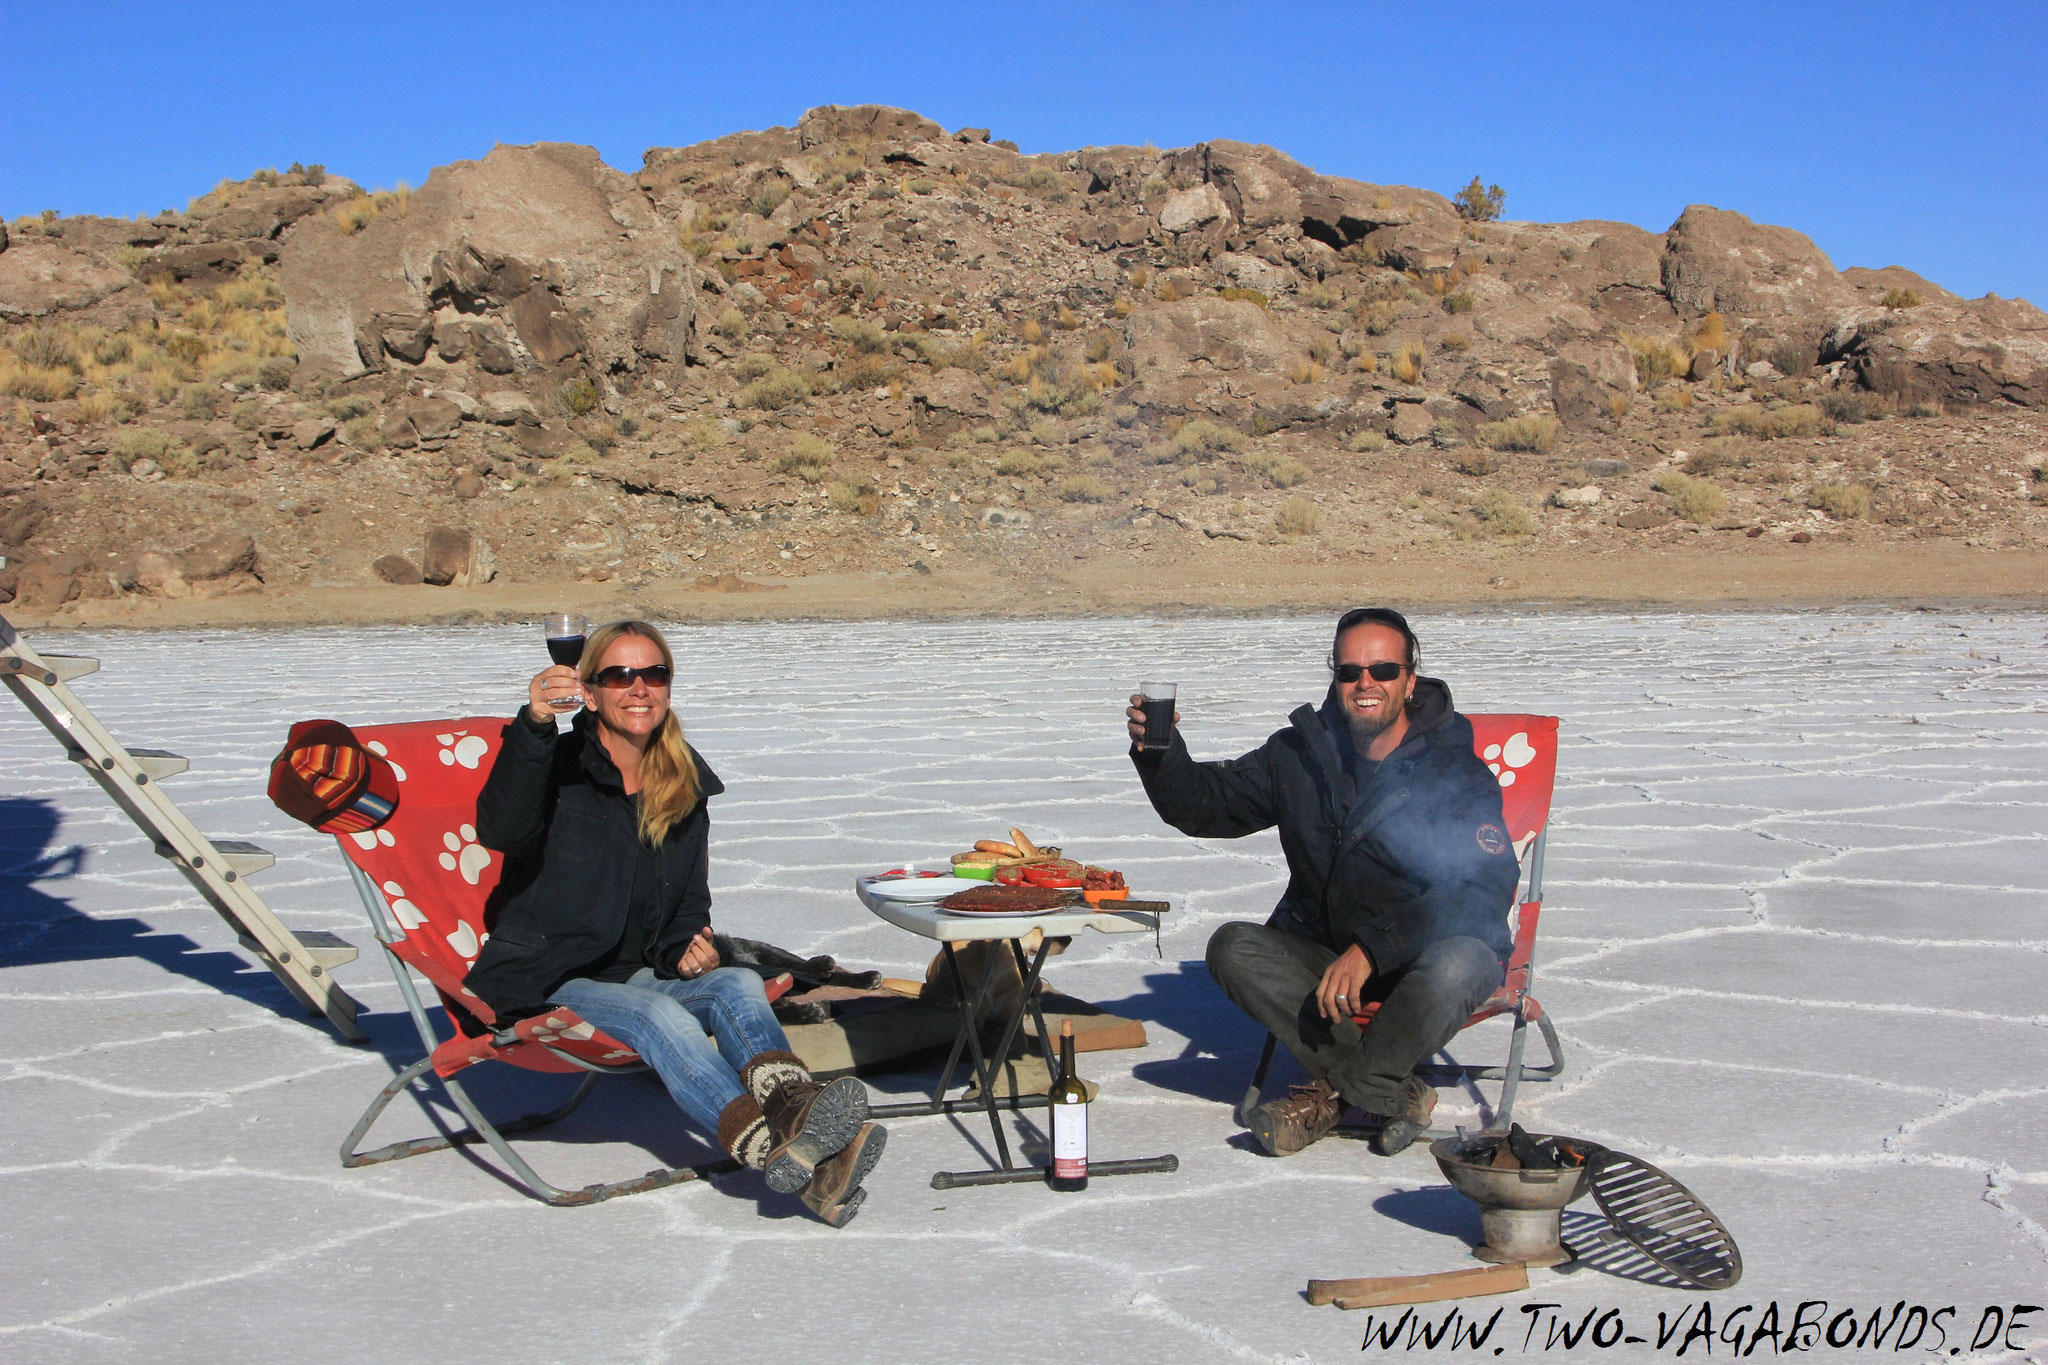 BOLIVIEN 2015 - SALAR DE UYUNI - GRILL SESSION AUF DEM SALAR